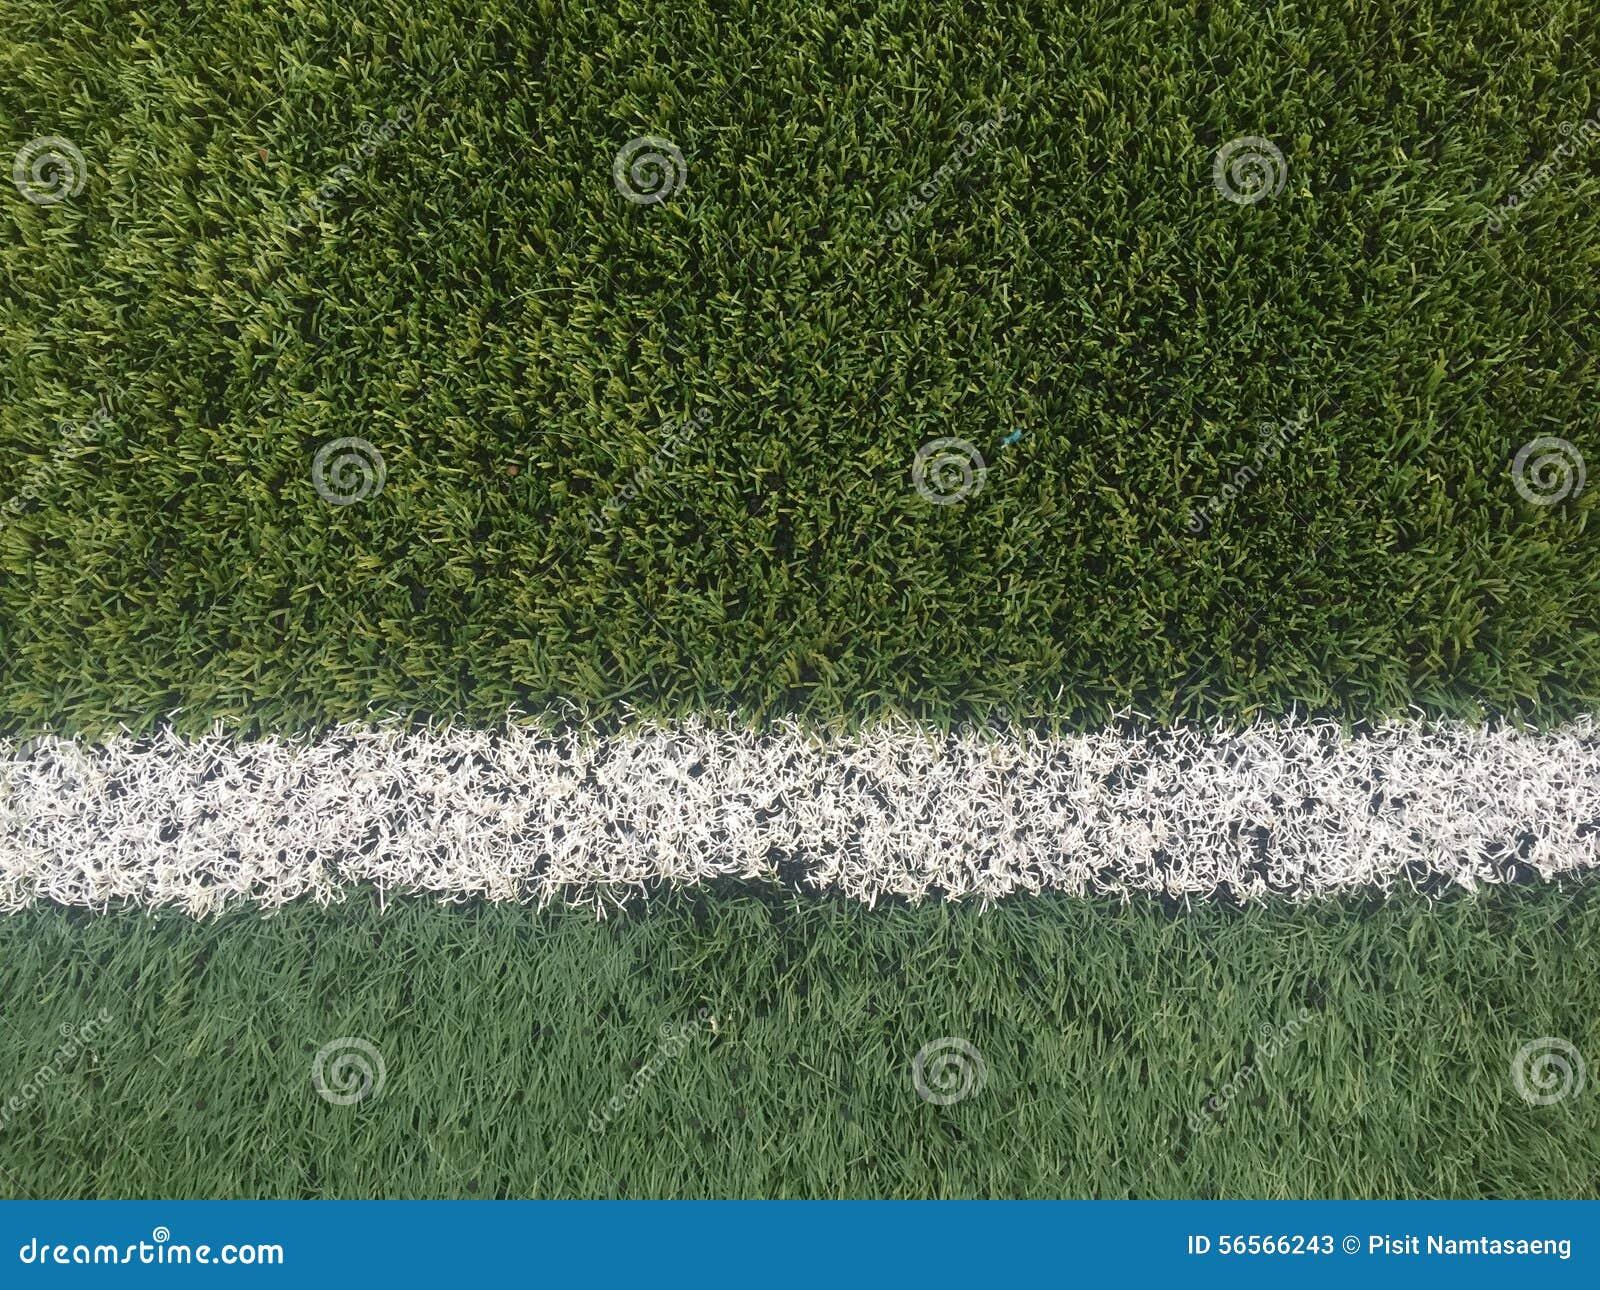 Download Ποδόσφαιρο στοκ εικόνα. εικόνα από χλόη, πράσινος, πεδίο - 56566243